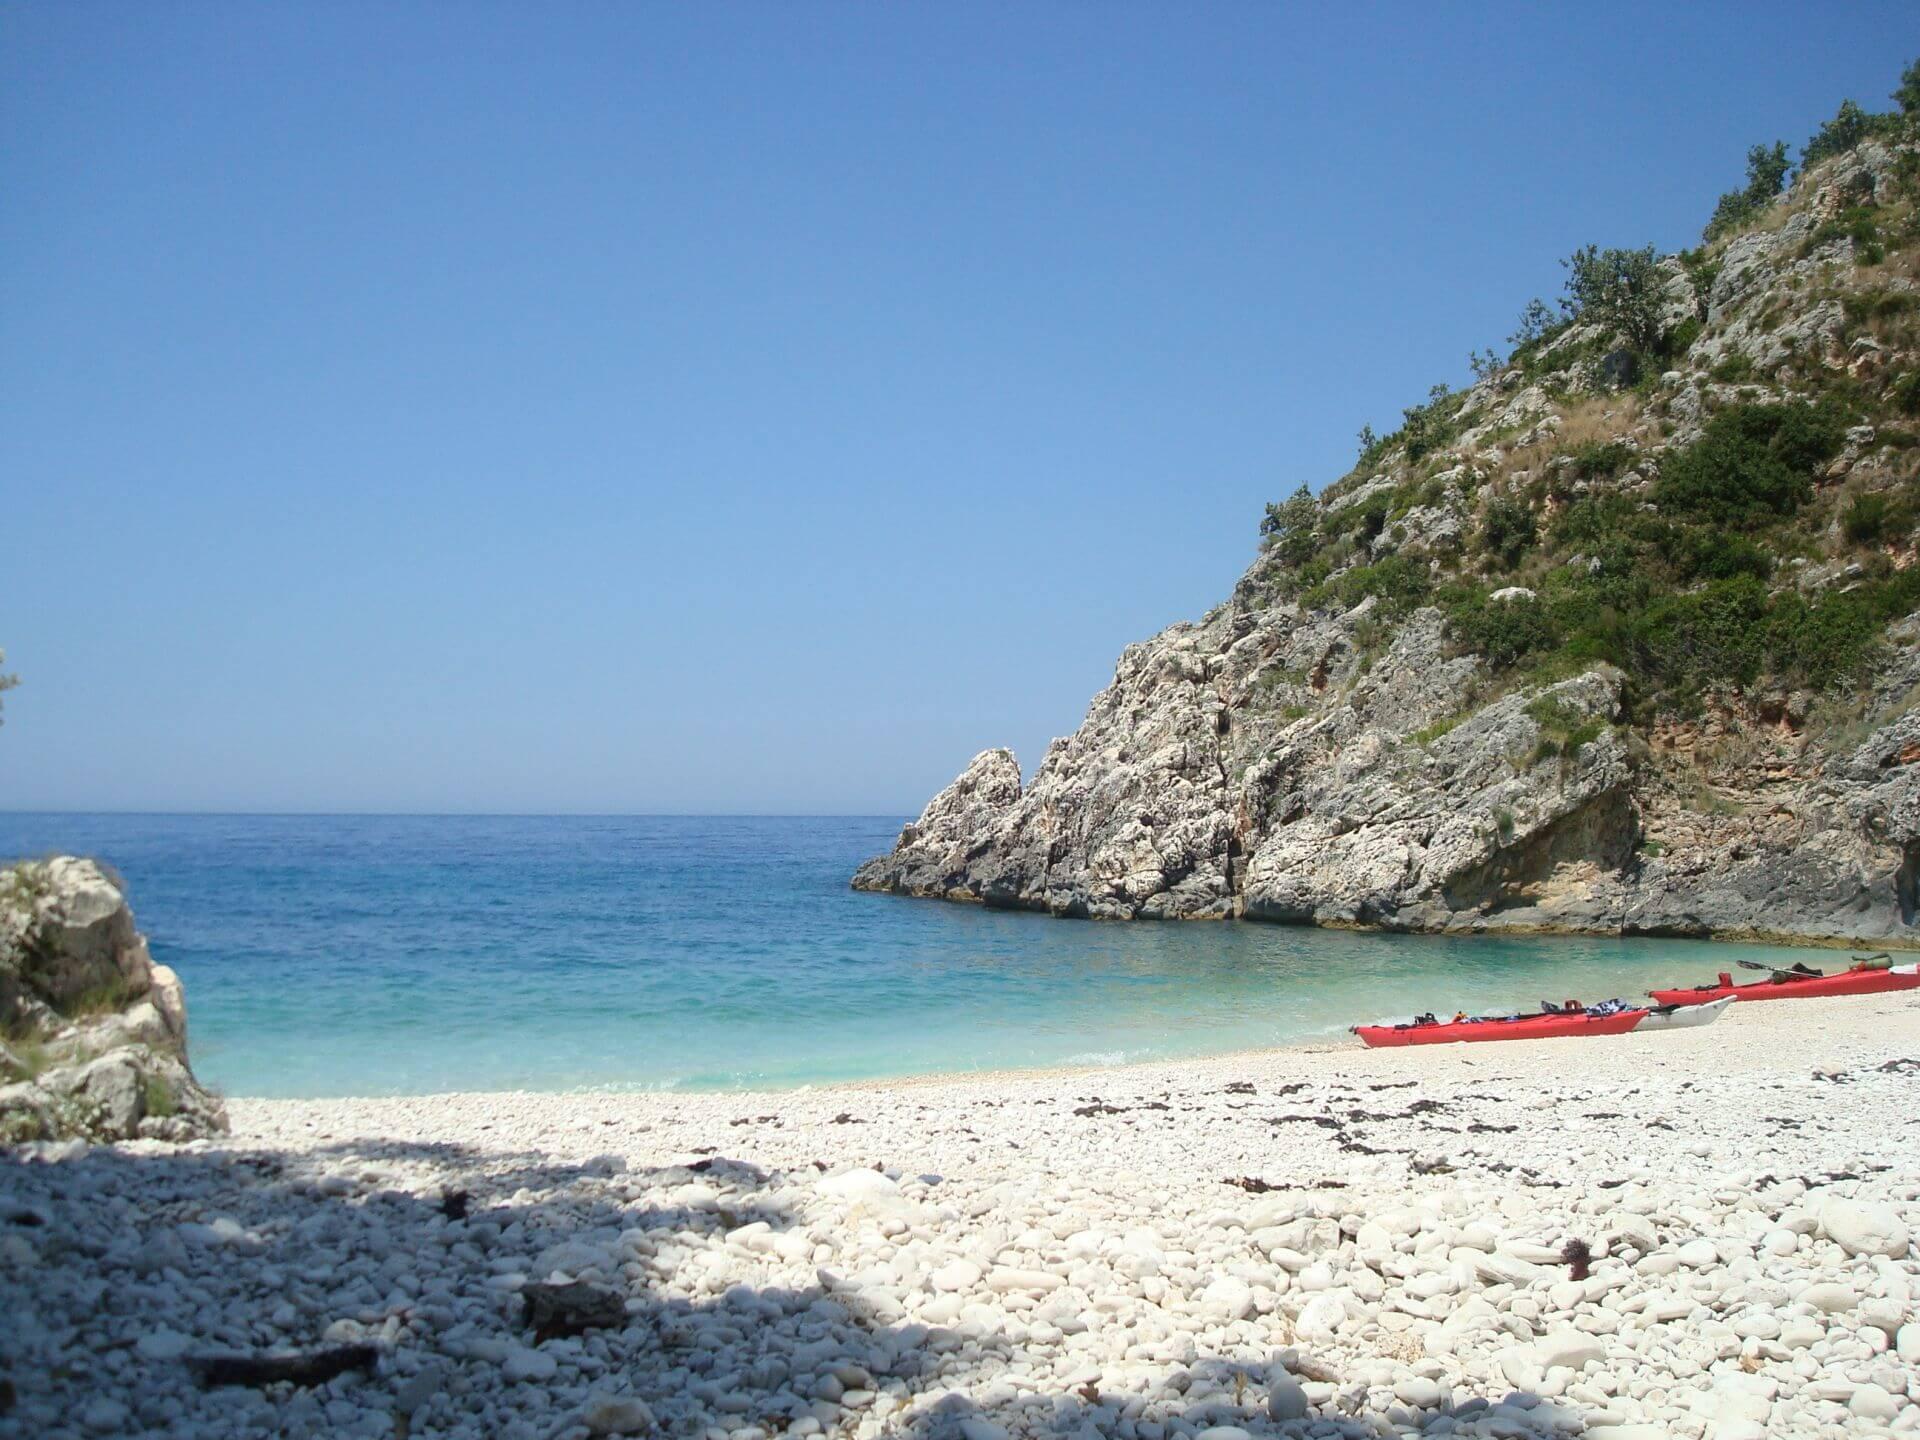 Strandvakantie: Strandvakantie In Albanië Aan De Albanese Riviera